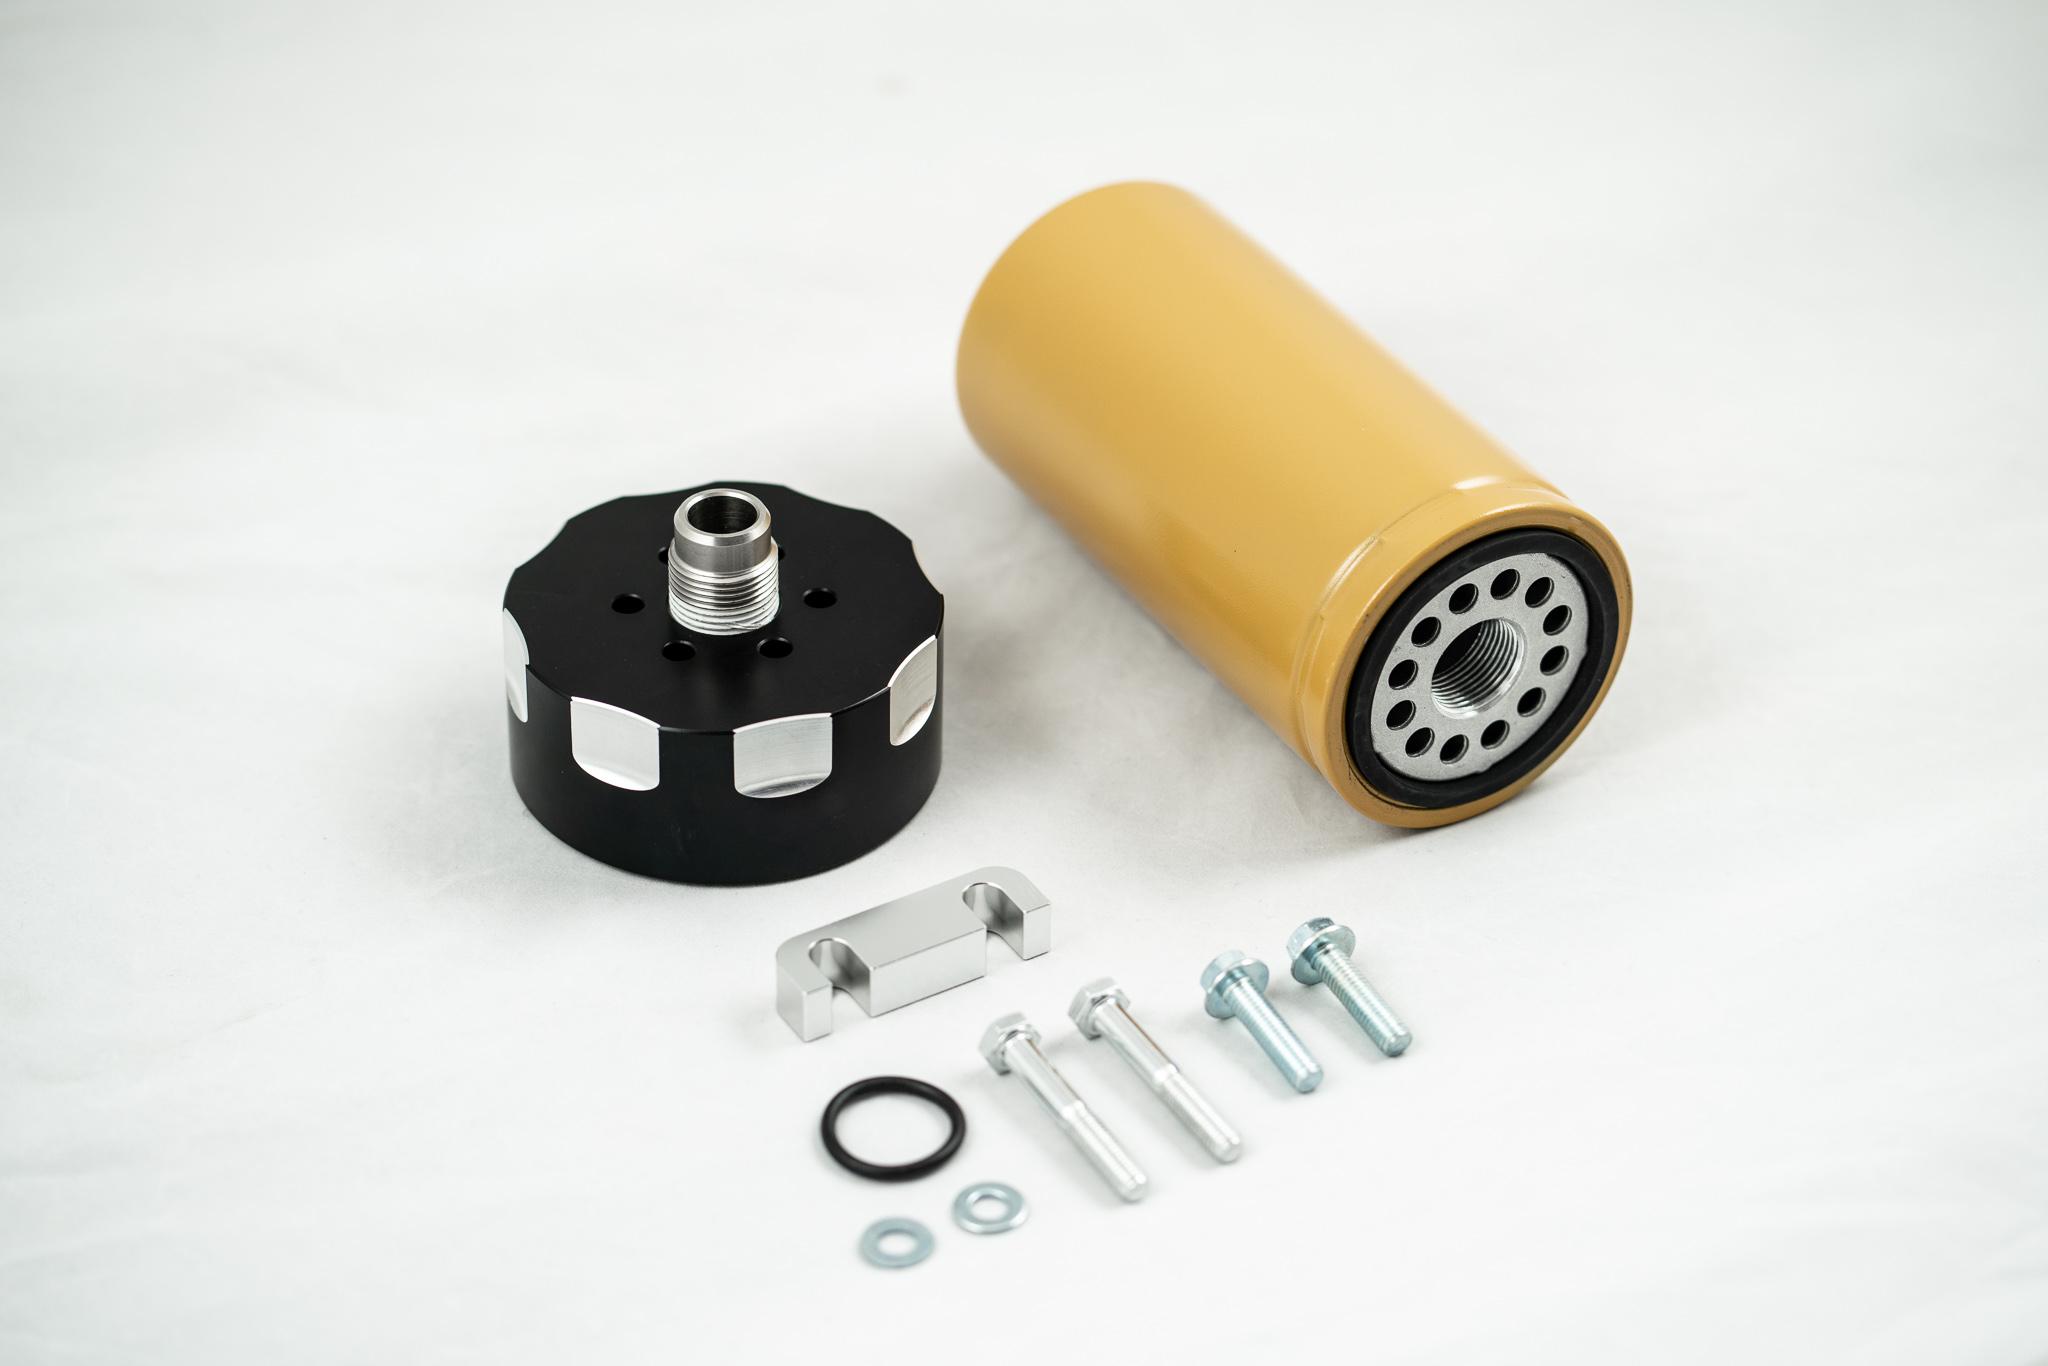 Rdp Cat Fuel Filter Adapter For 01 16 Gm 66l Lb7 Lly Lbz Lmm Lml Duramax Diesel Filters